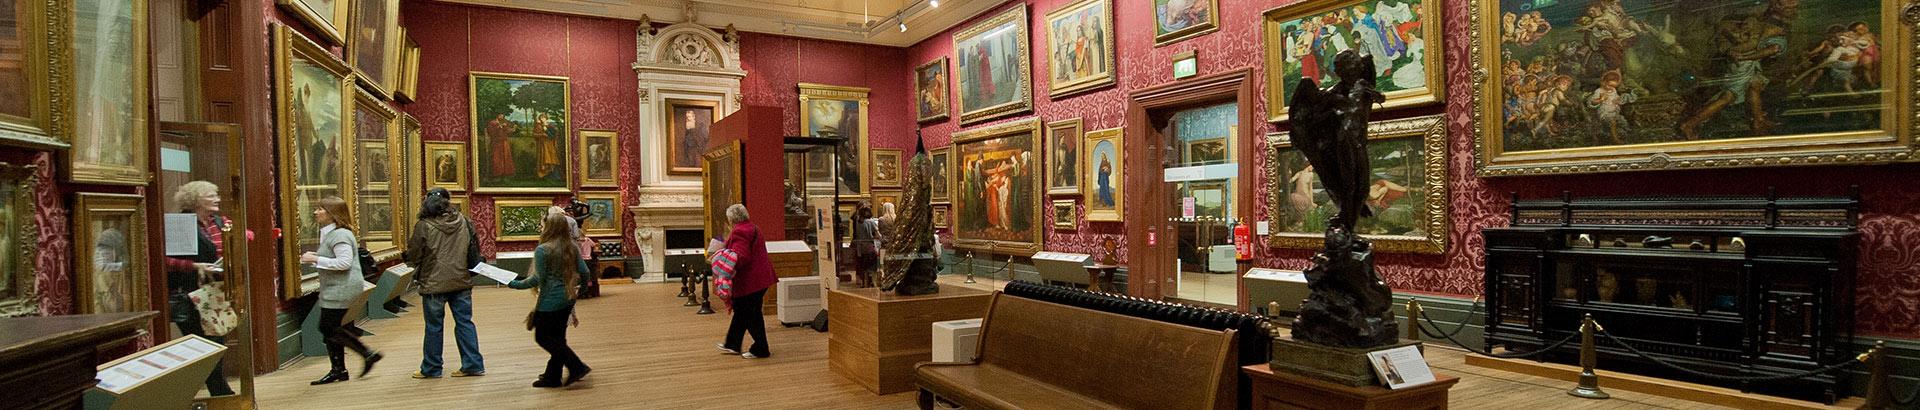 Interior of a museum